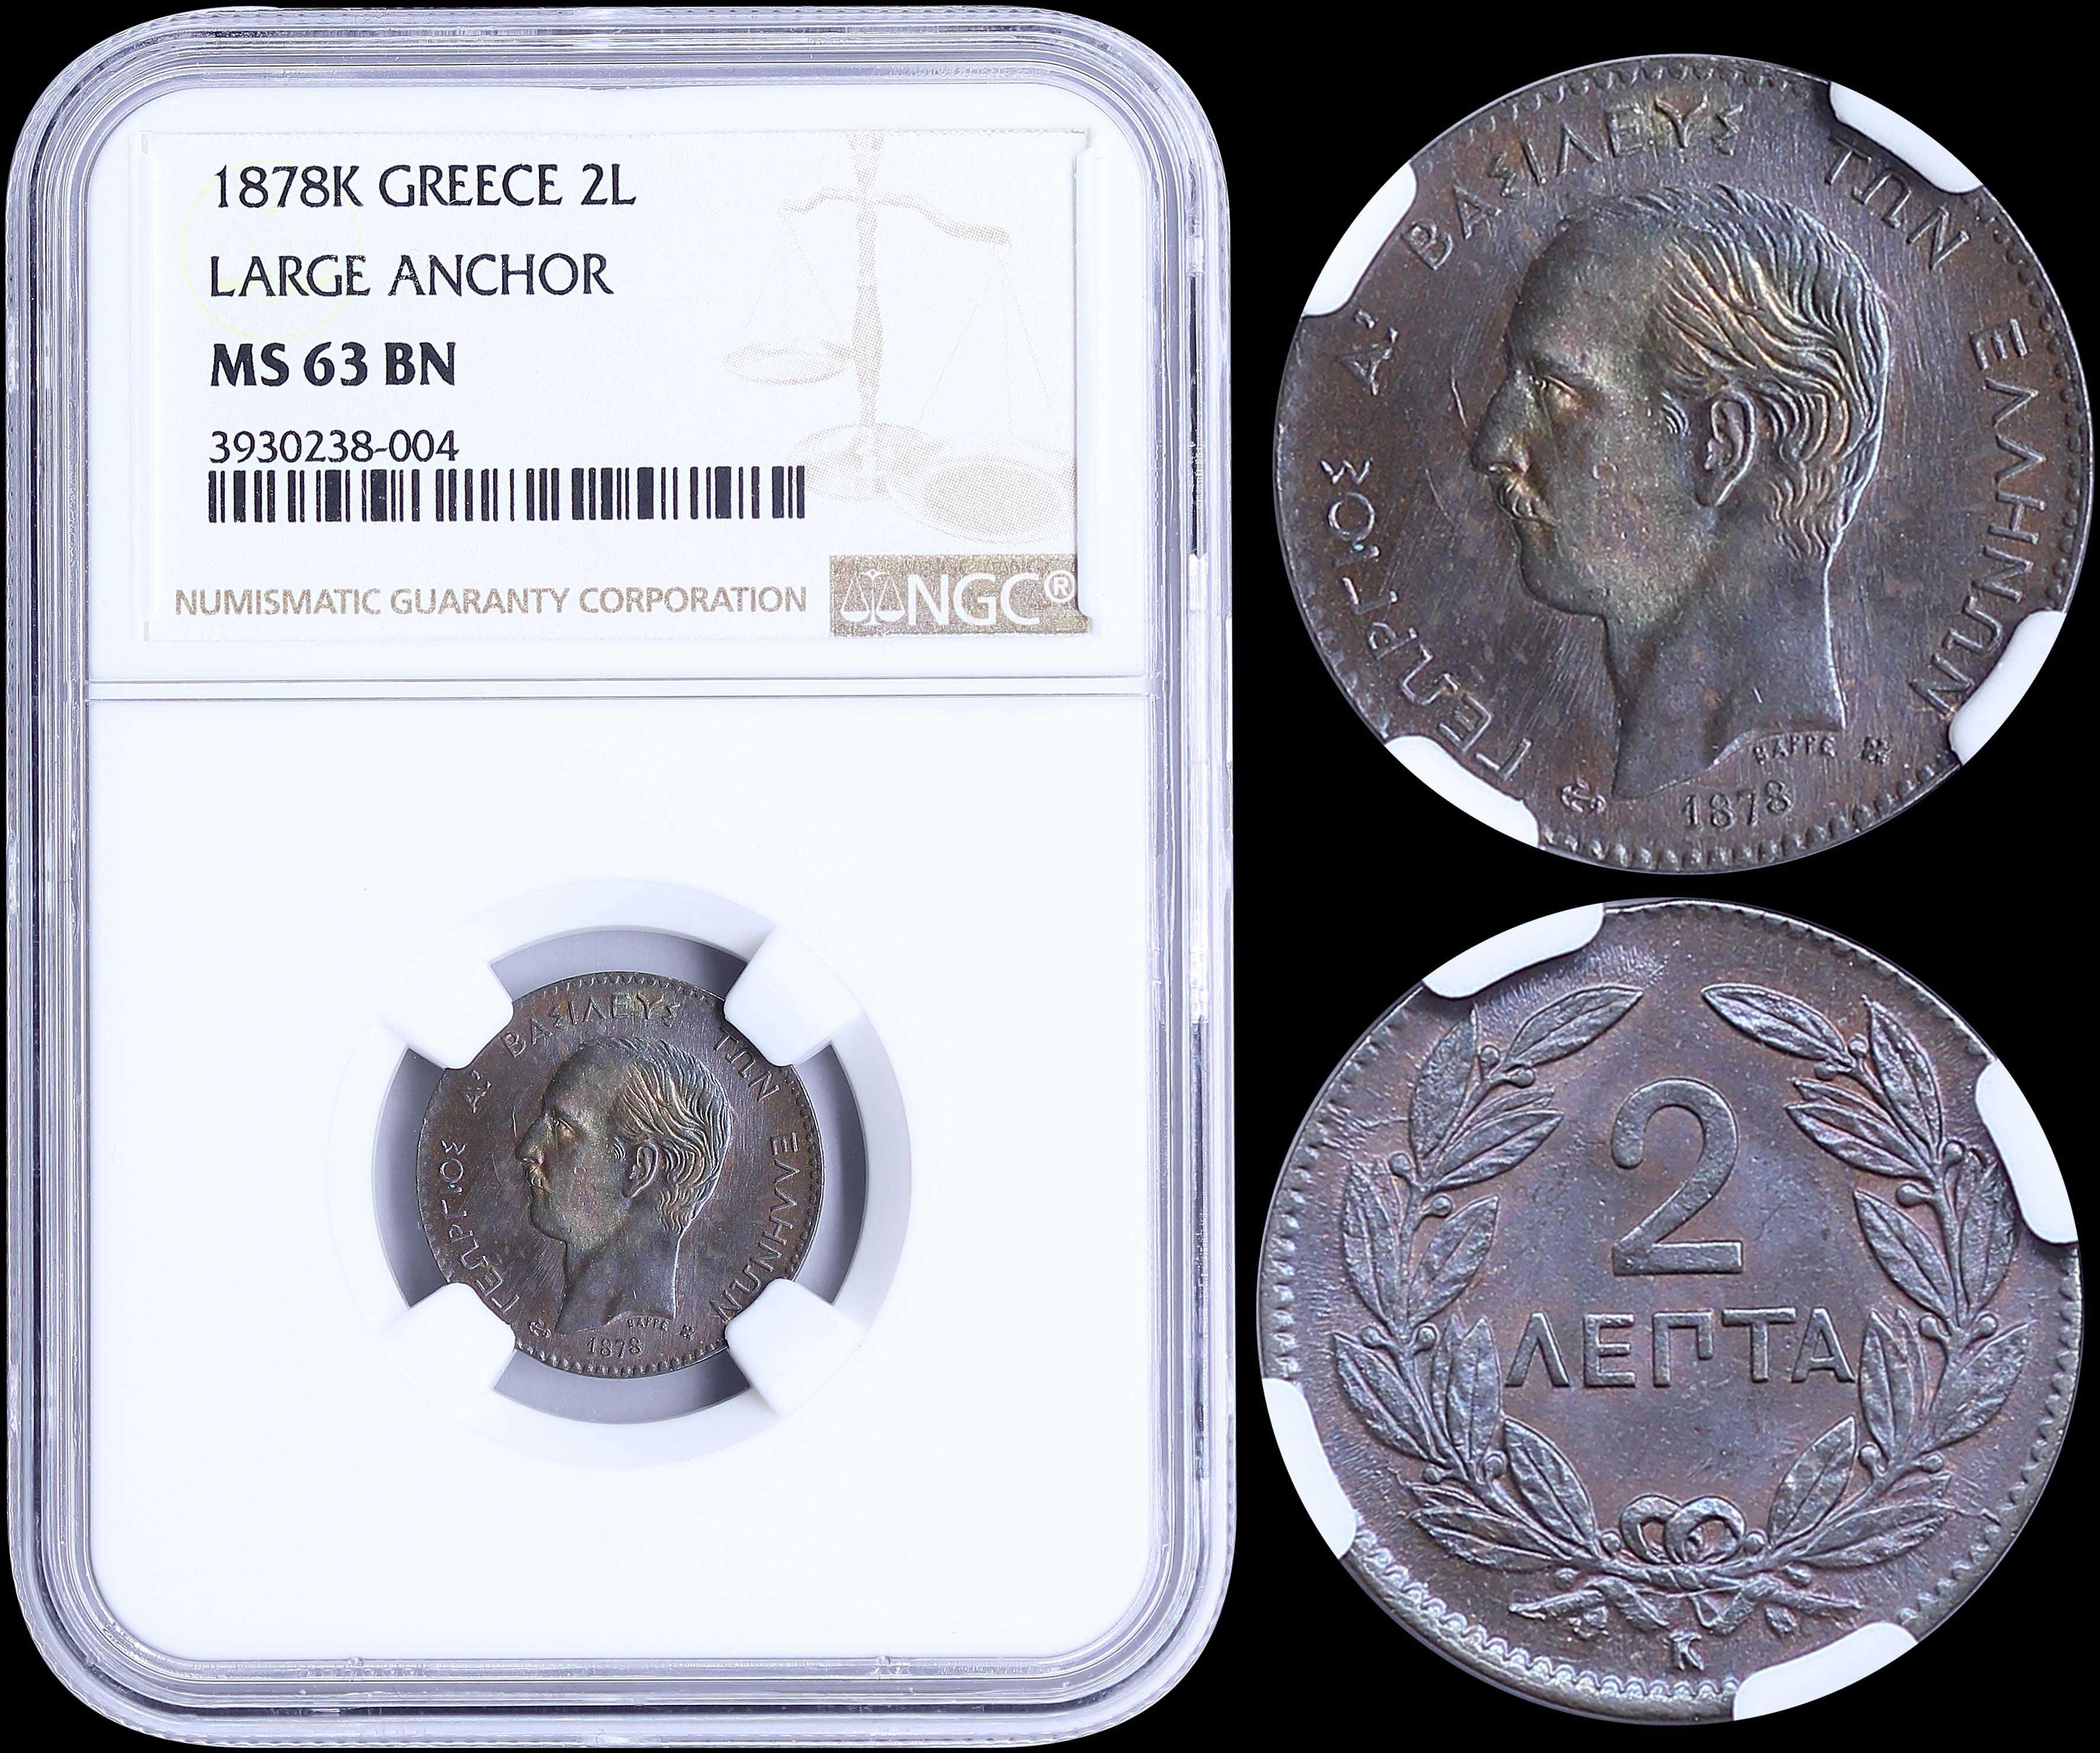 Lot 8135 - -  COINS & TOKENS king george i -  A. Karamitsos Public & Live Bid Auction 644 Coins, Medals & Banknotes